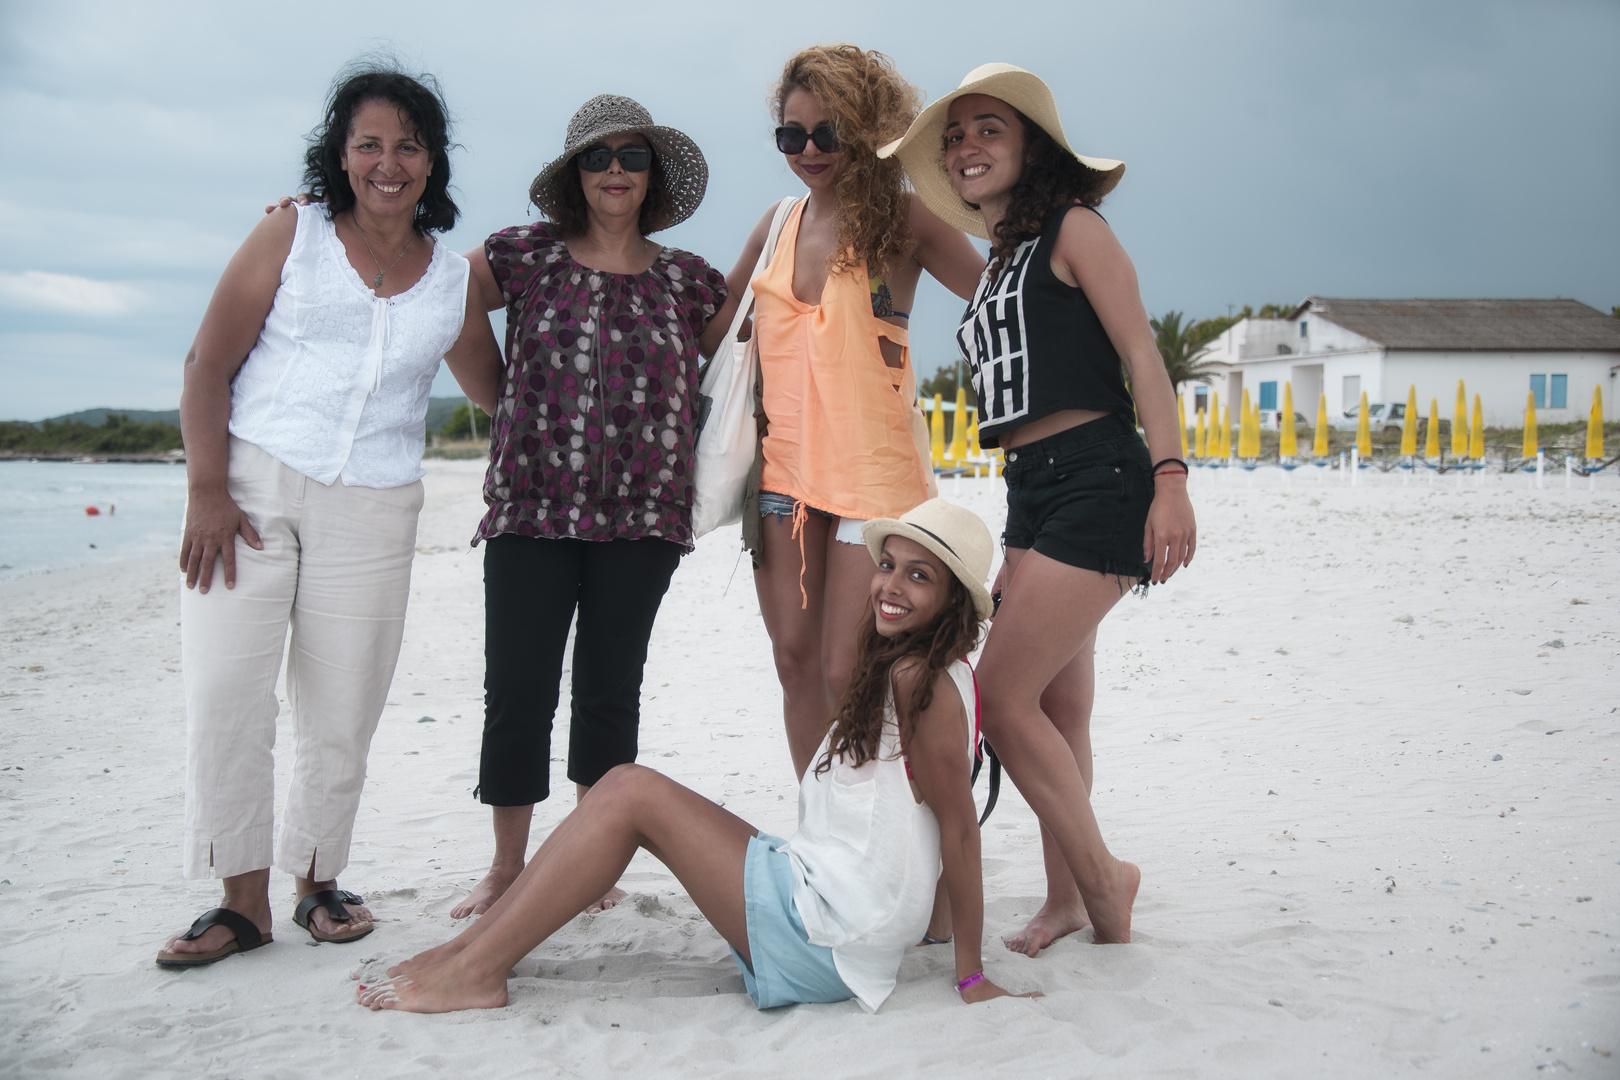 Begegnung am Strand